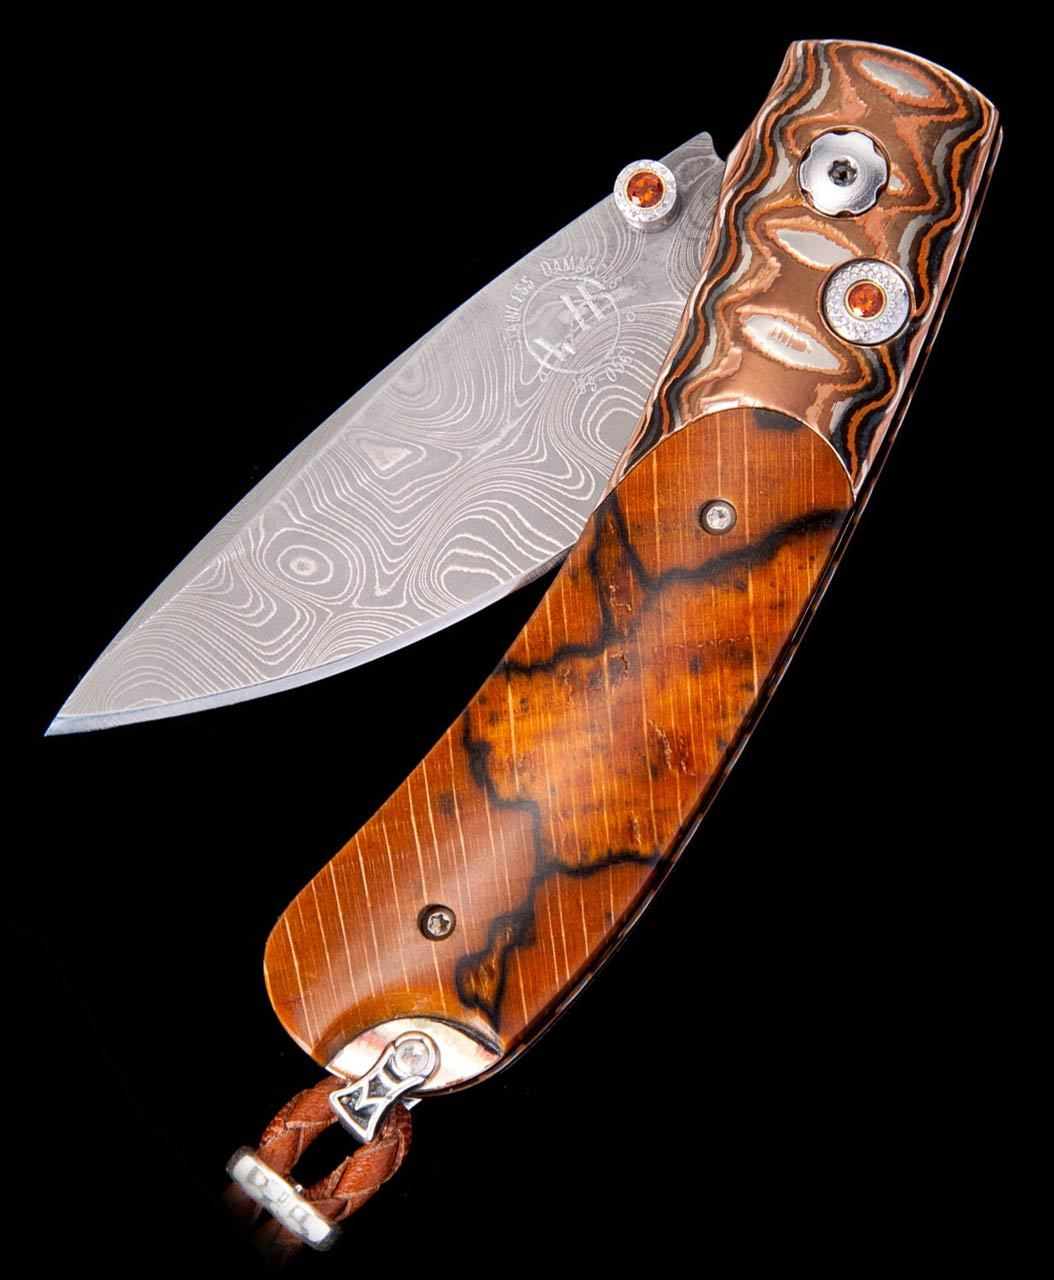 William Henry Kestrel Sand Storm Beechwood Inlay Pocket Knife